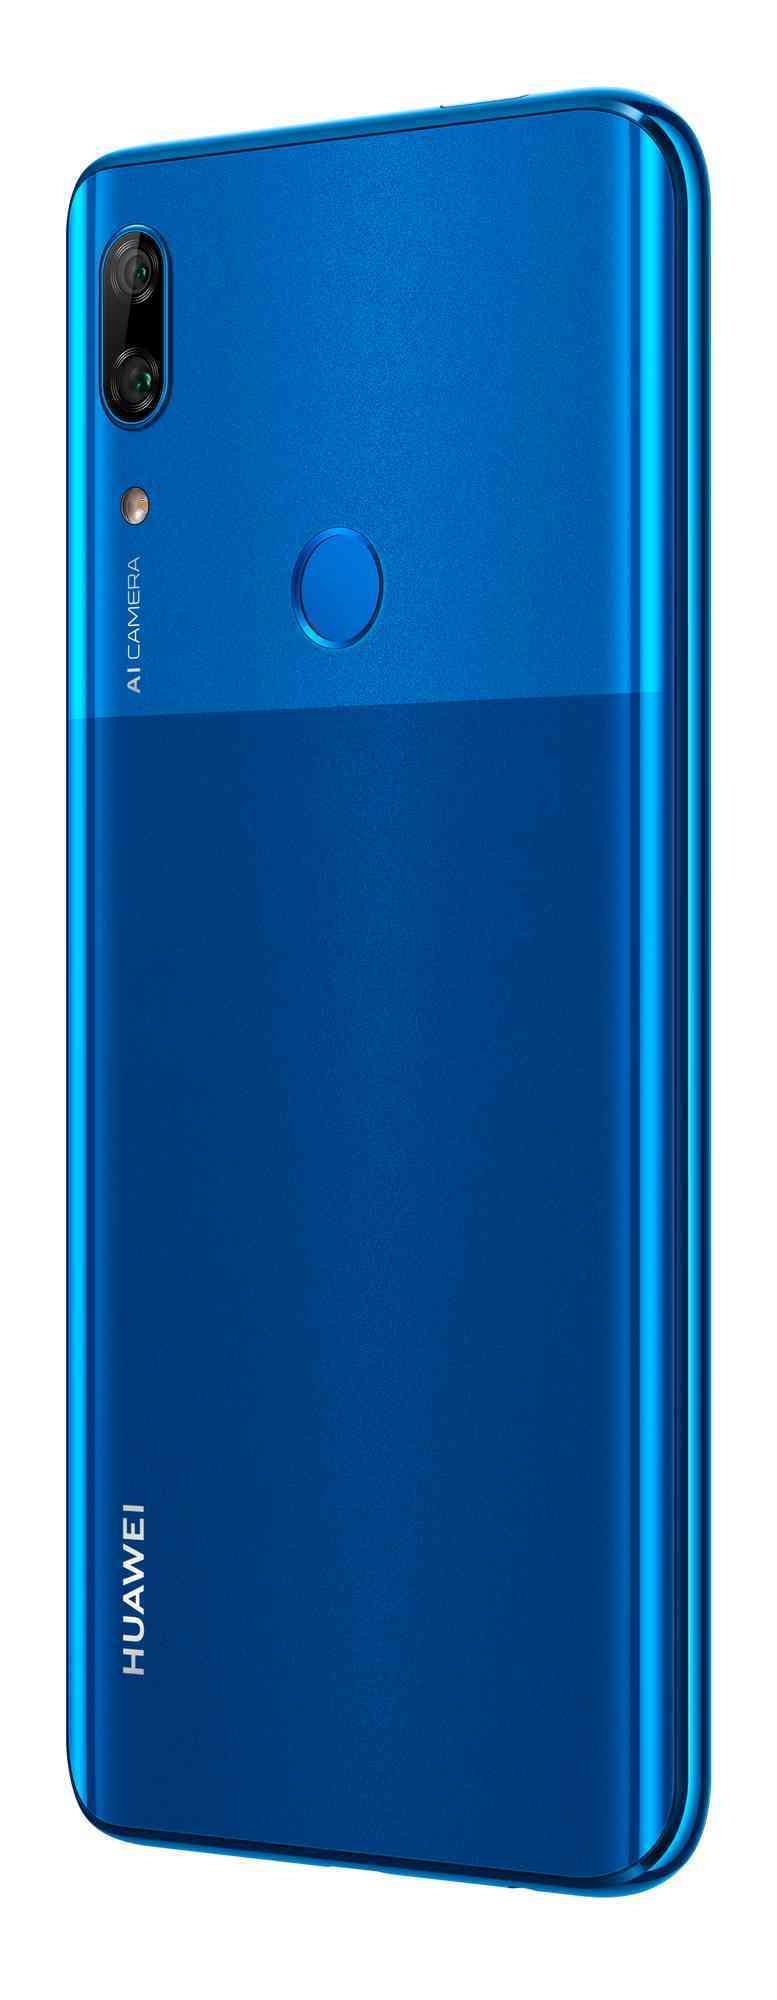 Smartphone P Smart Z 64 Go Huawei Bleu